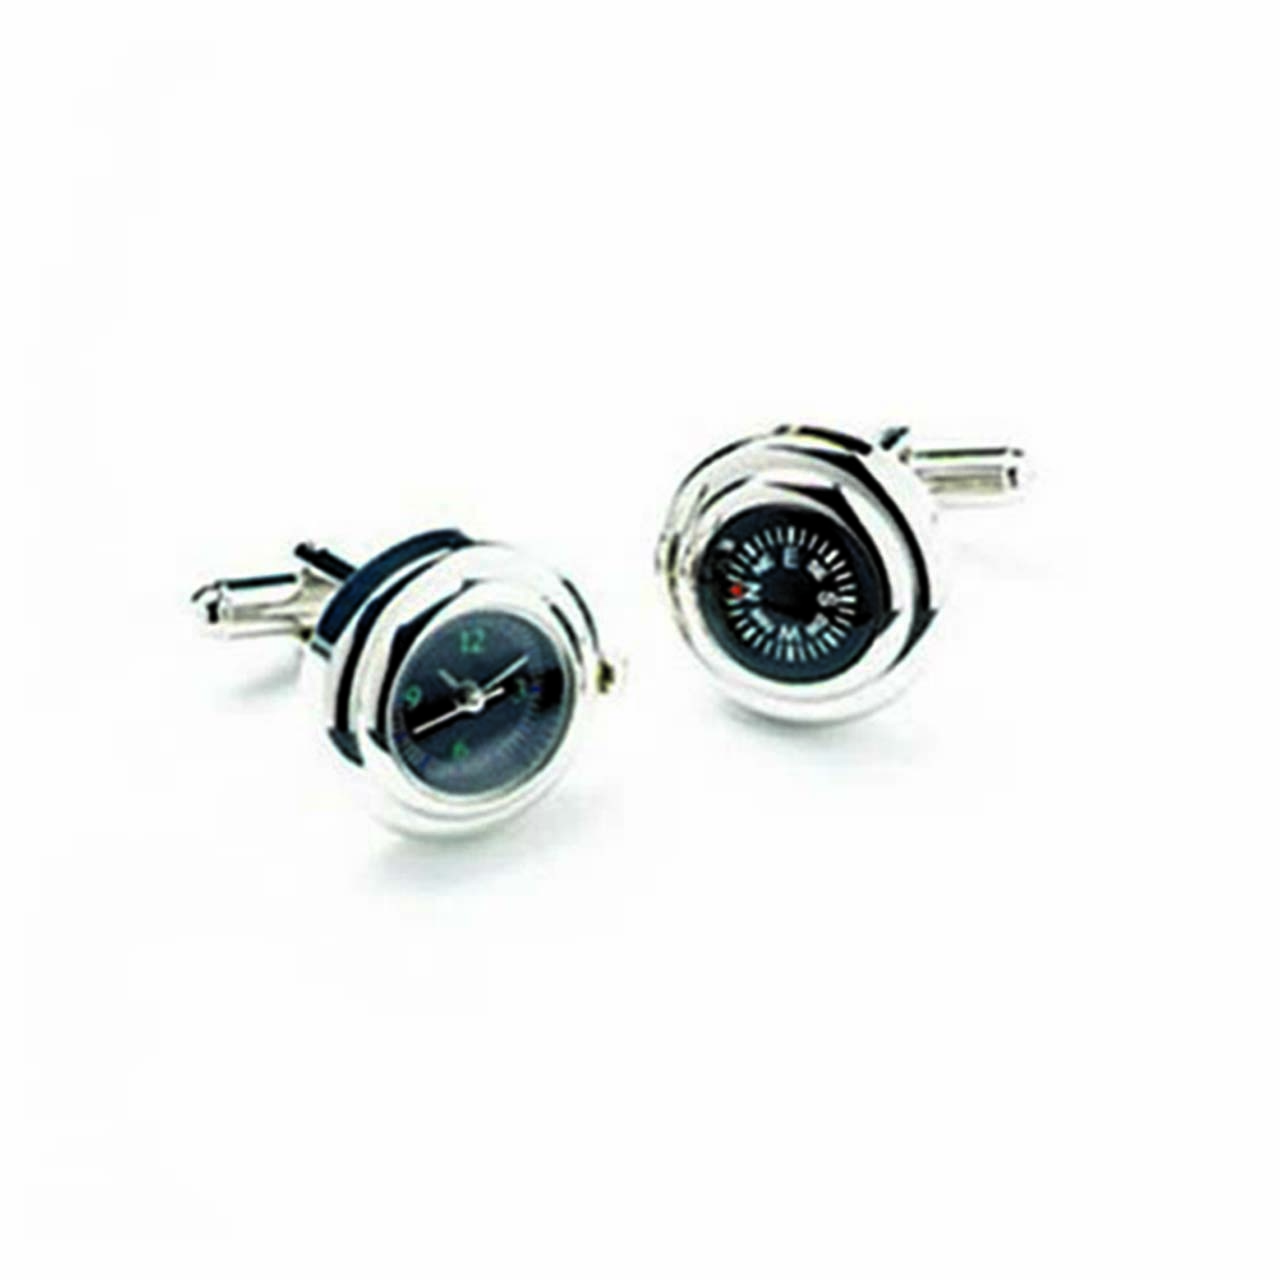 Rhodium Watch And Compass Cufflinks